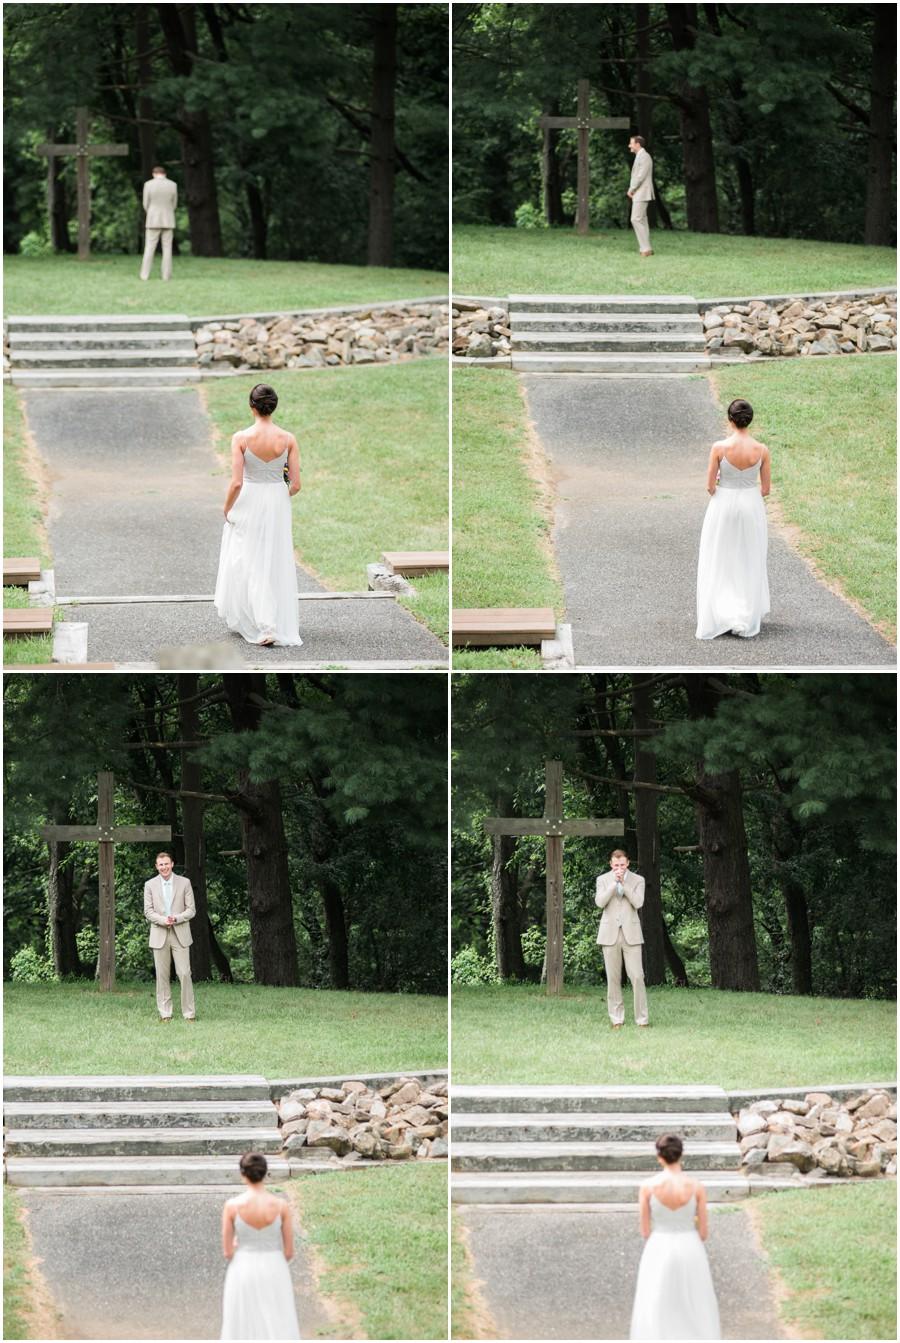 Bohemian-Howard-County-Conservancy-Wedding-Chelsea-Blanch-Photography-7